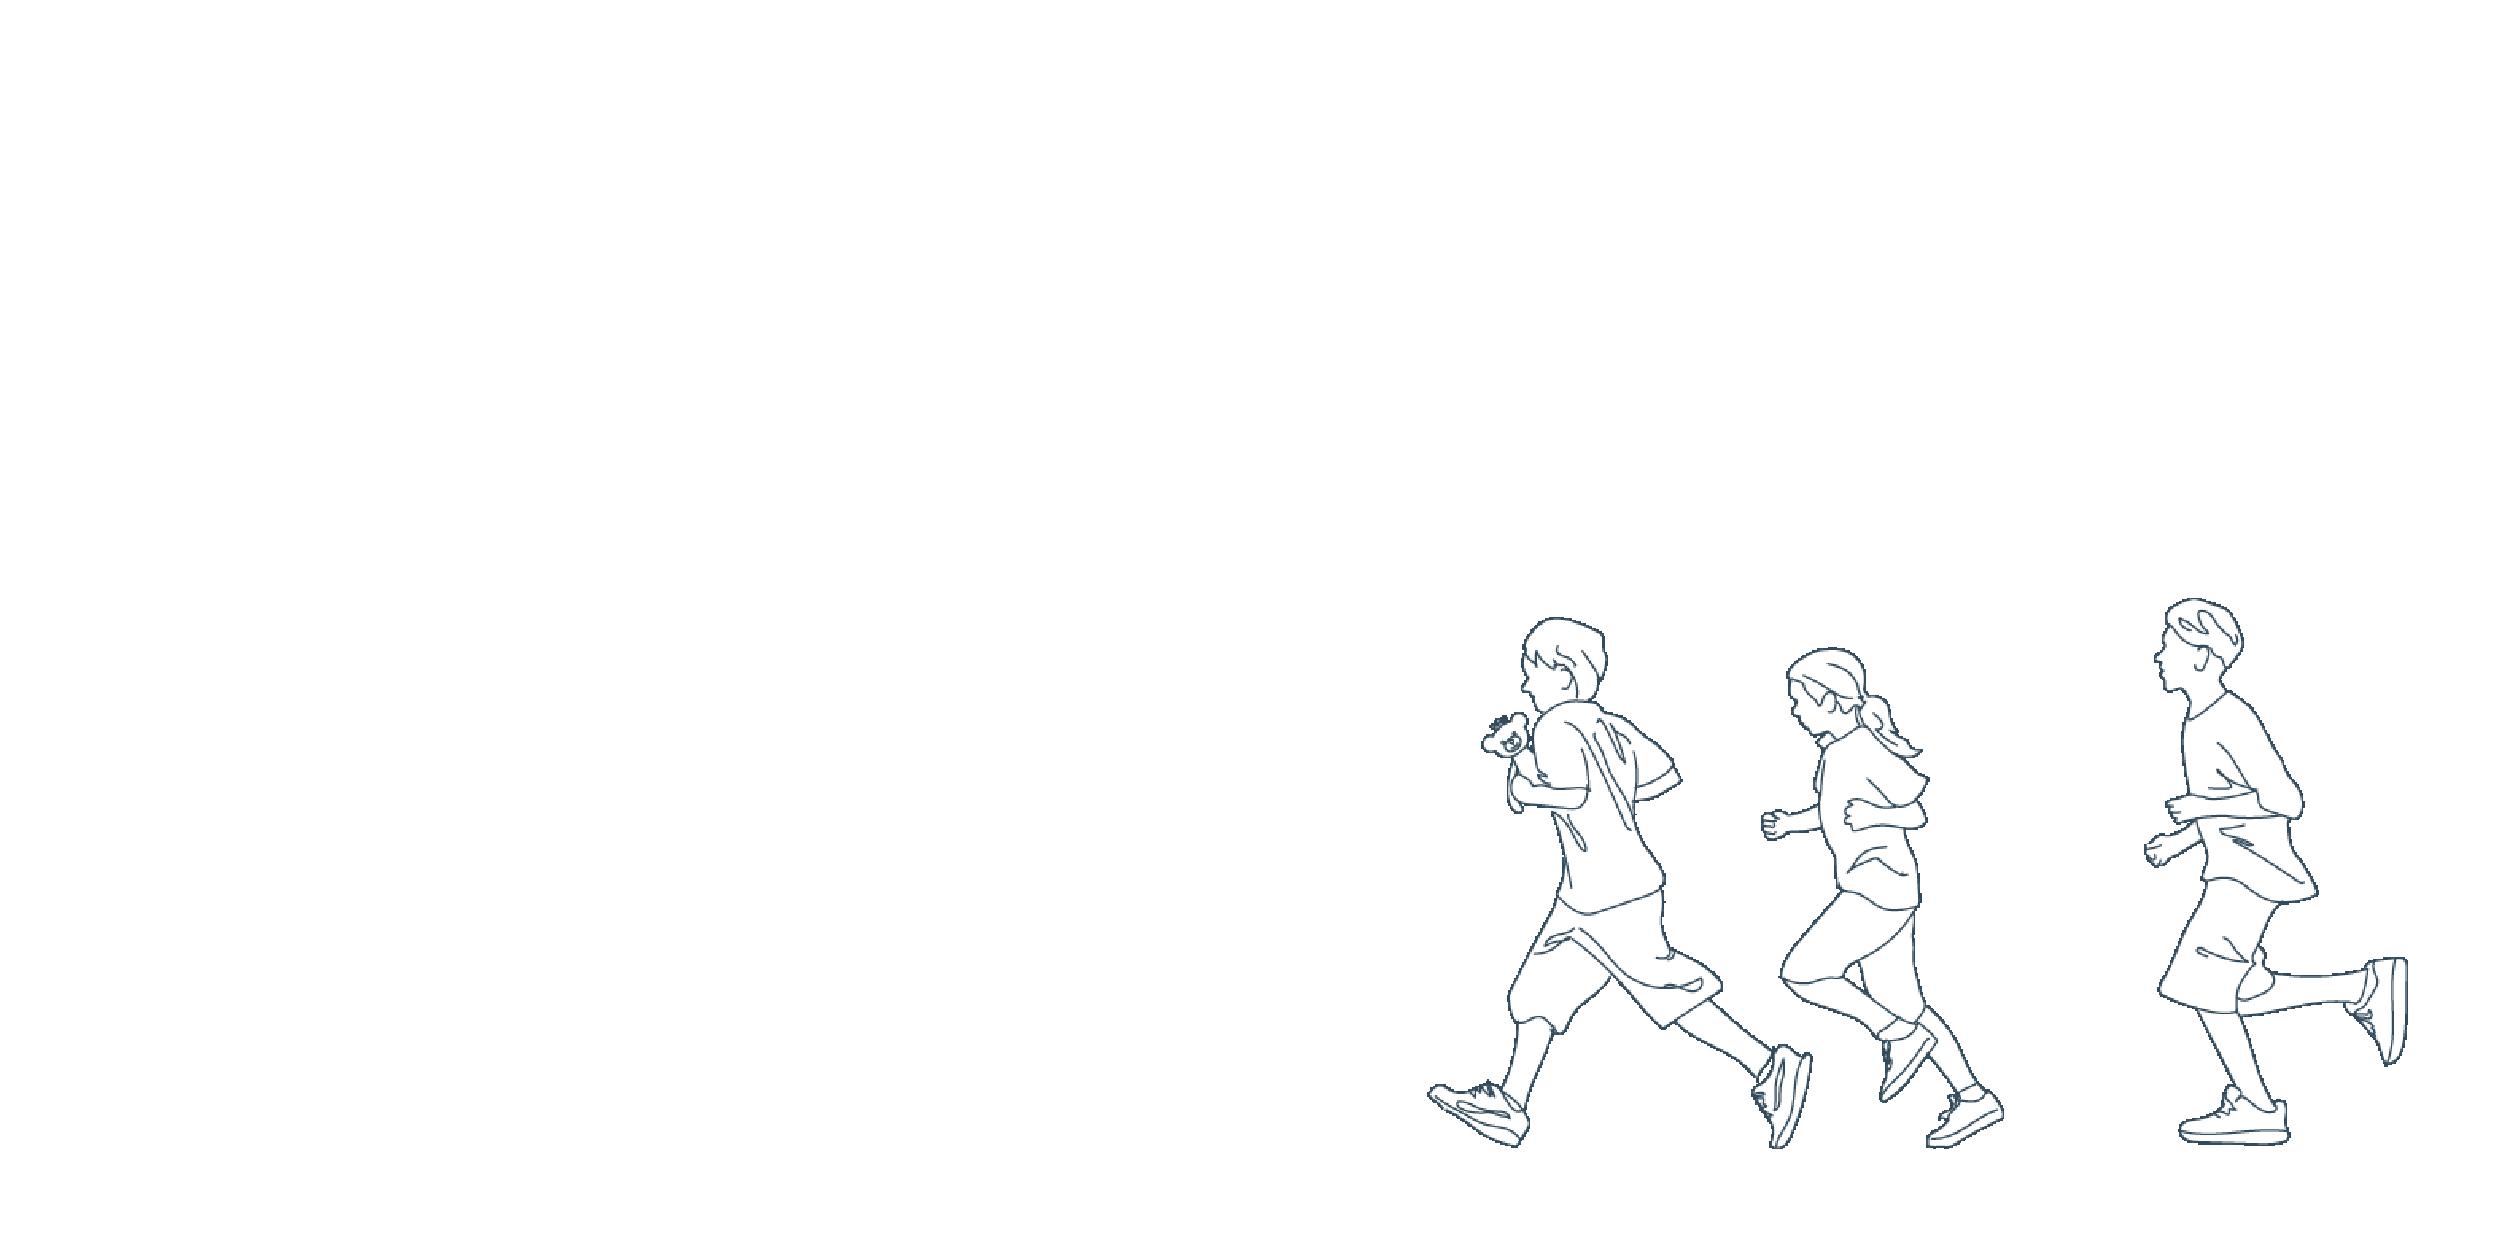 Kids-01.png